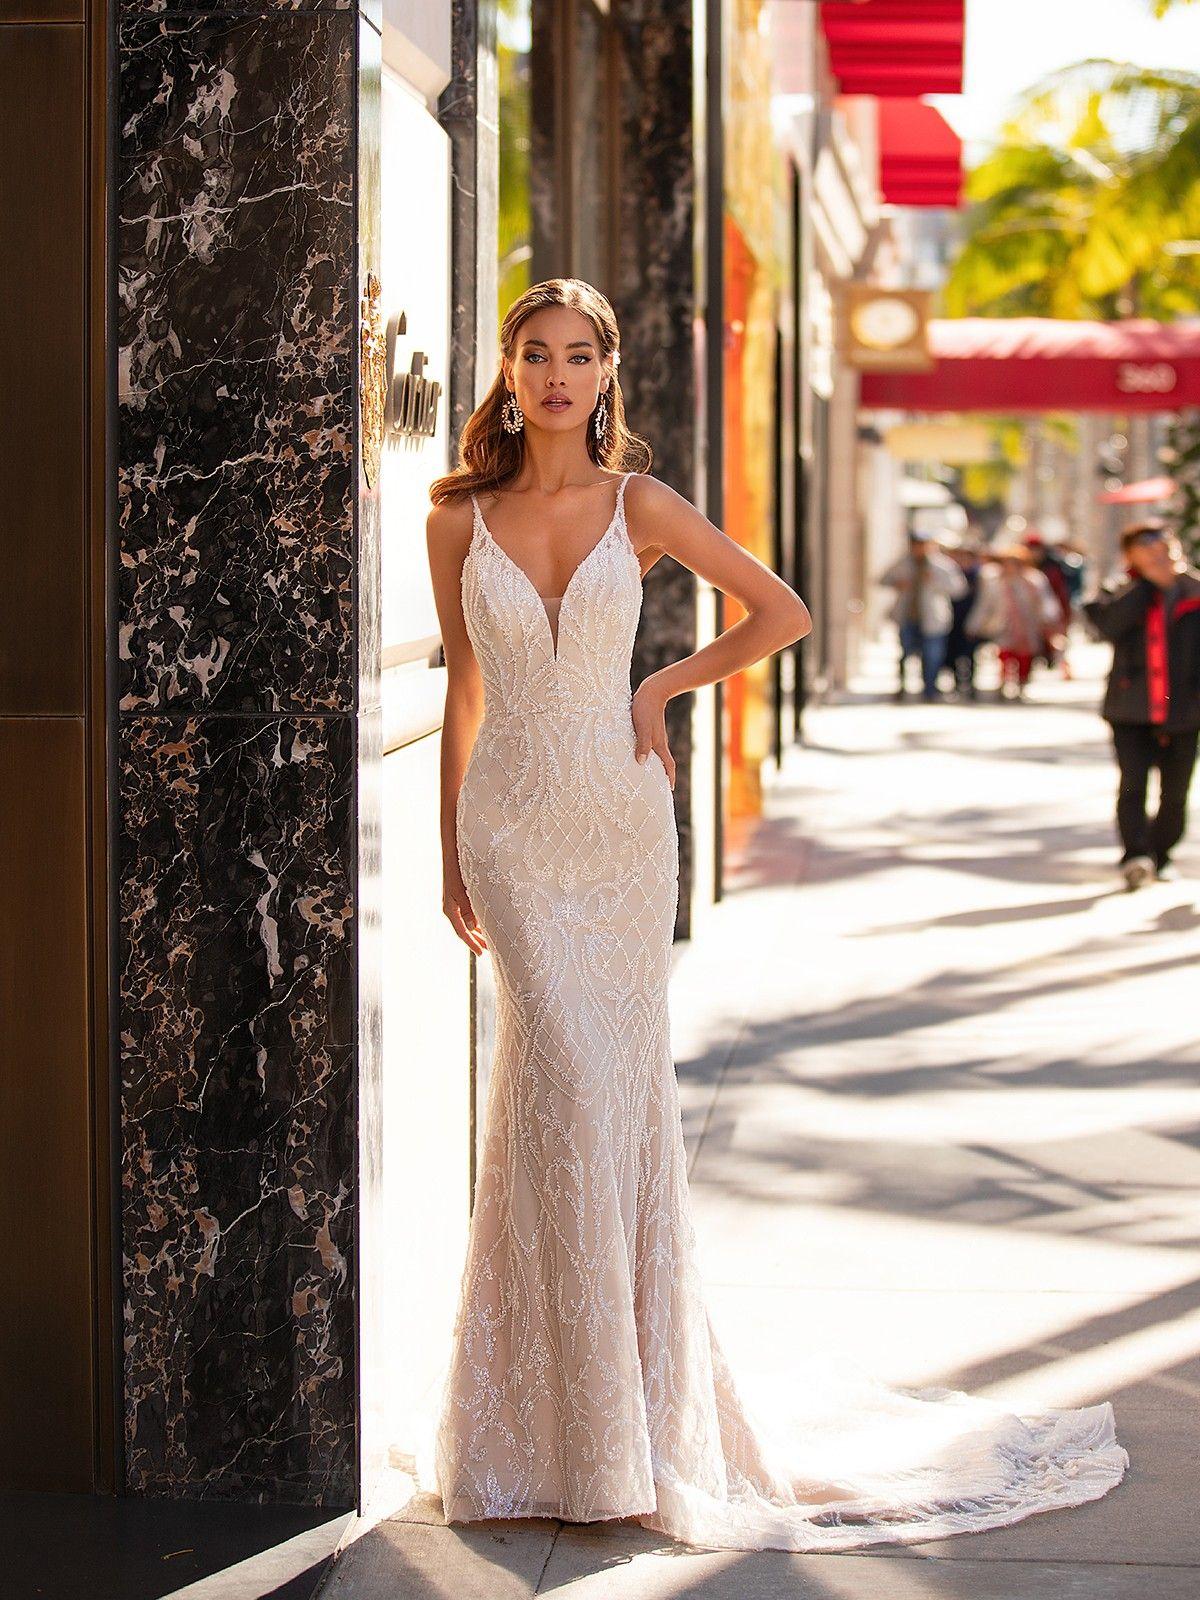 Beaded Sweetheart Neck Mermaid Couture Gown H1442 Moonlight Wedding Dress Moonlight Bridal Wedding Dresses [ 1600 x 1200 Pixel ]